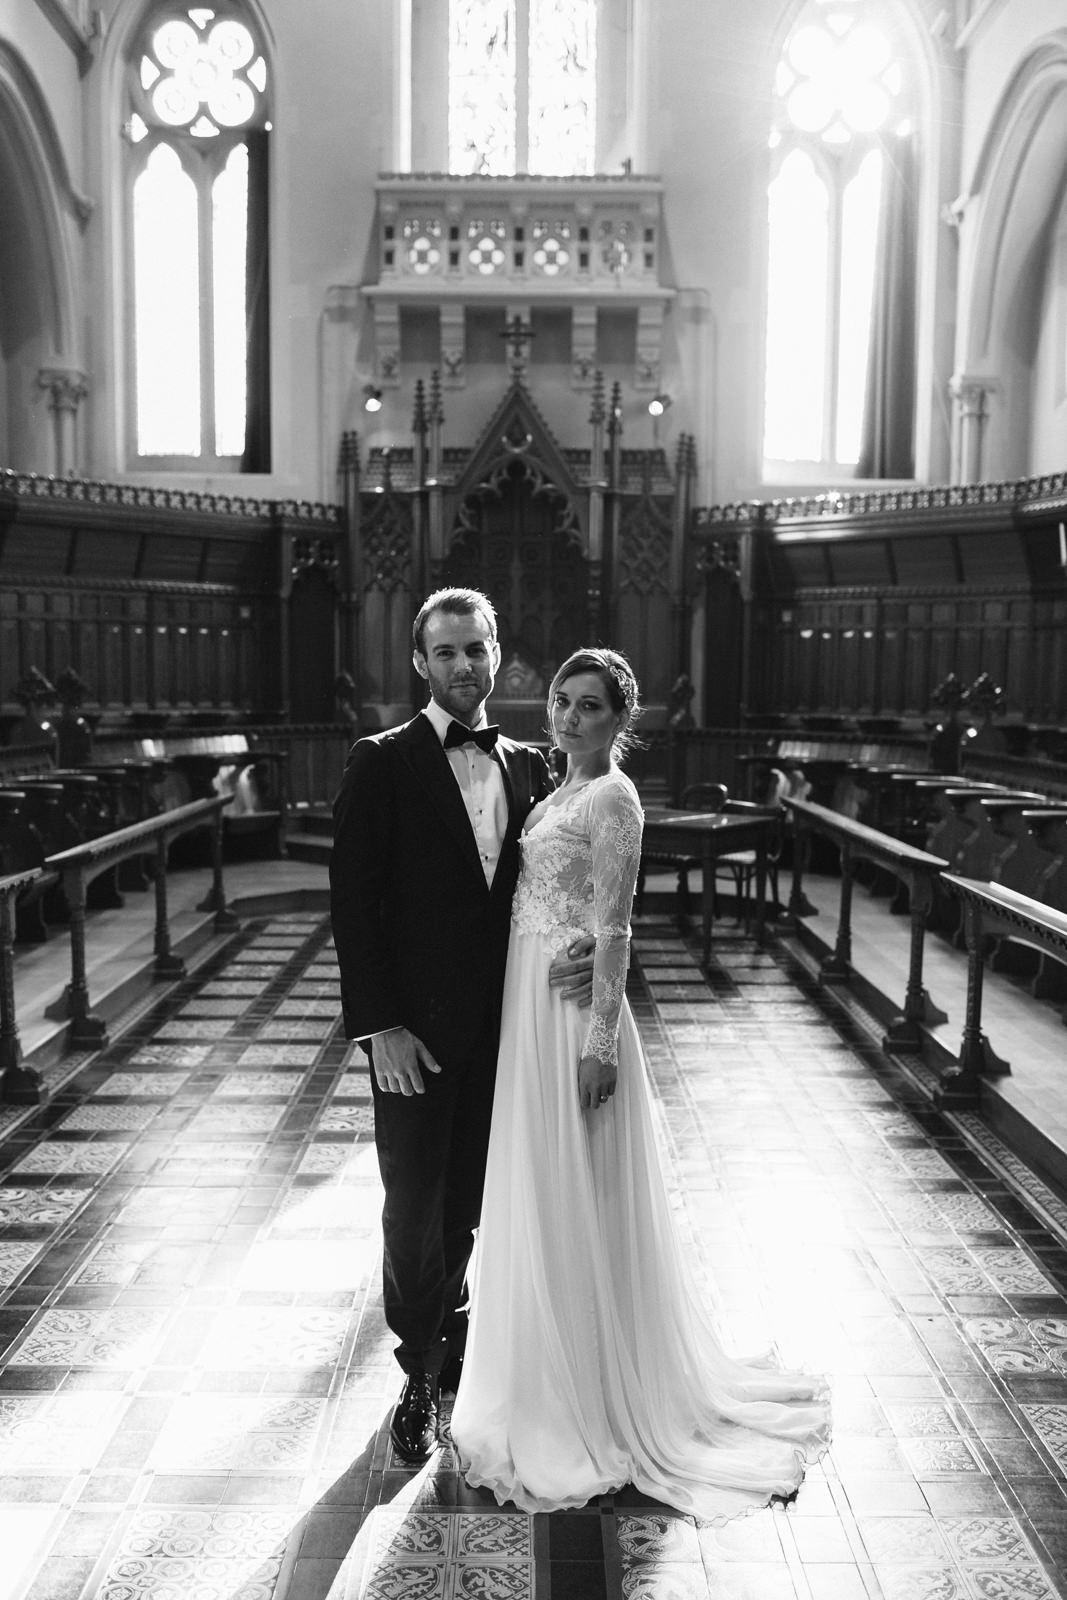 Stanbrooke Abbey Wedding Photographer-322480.jpg